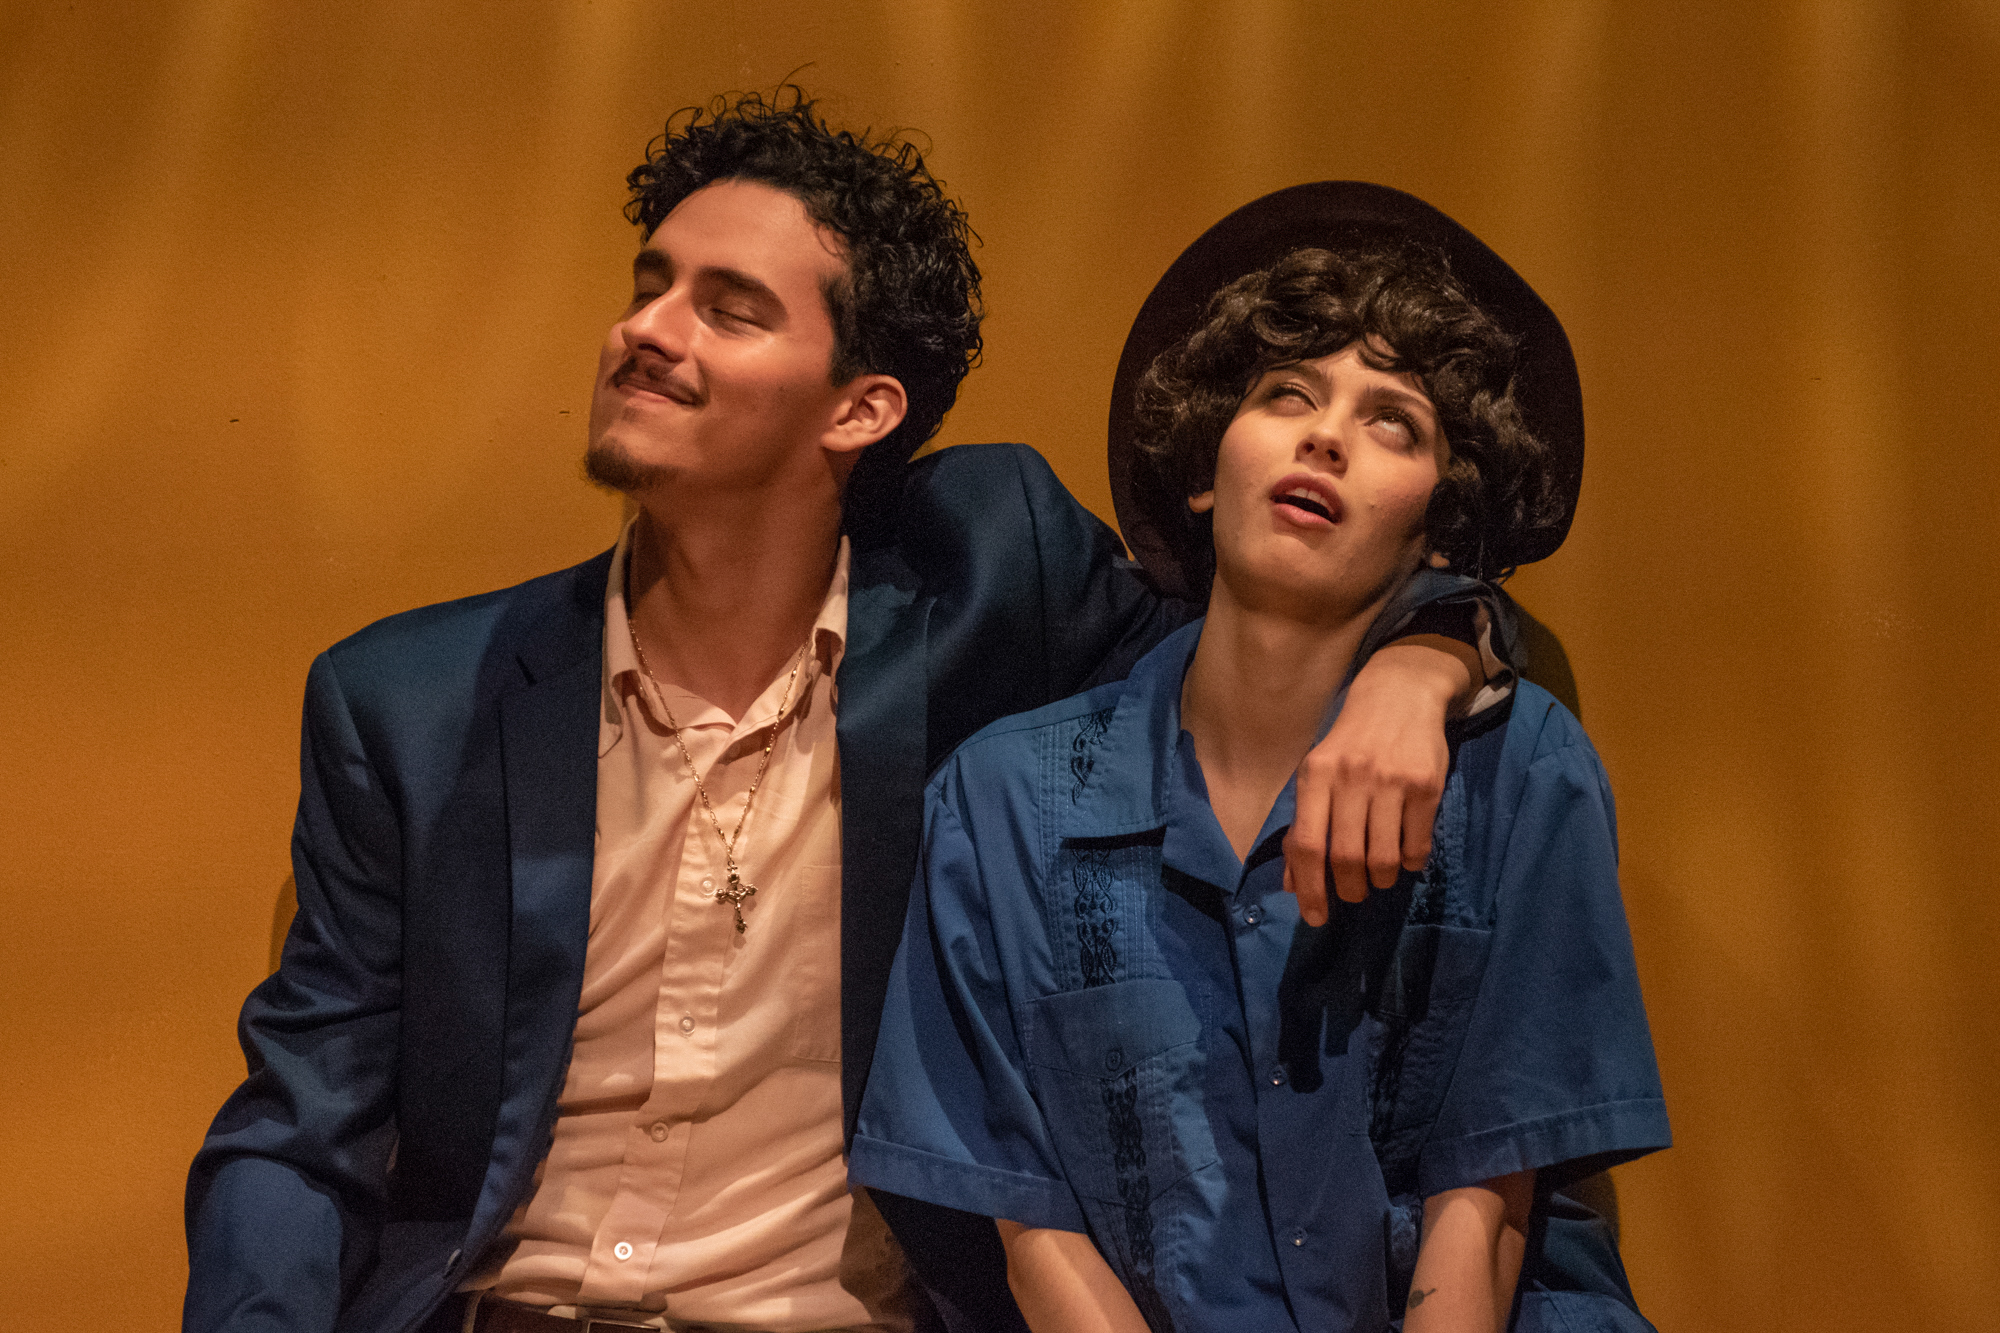 'Twelfth Night' strikes comedic gold